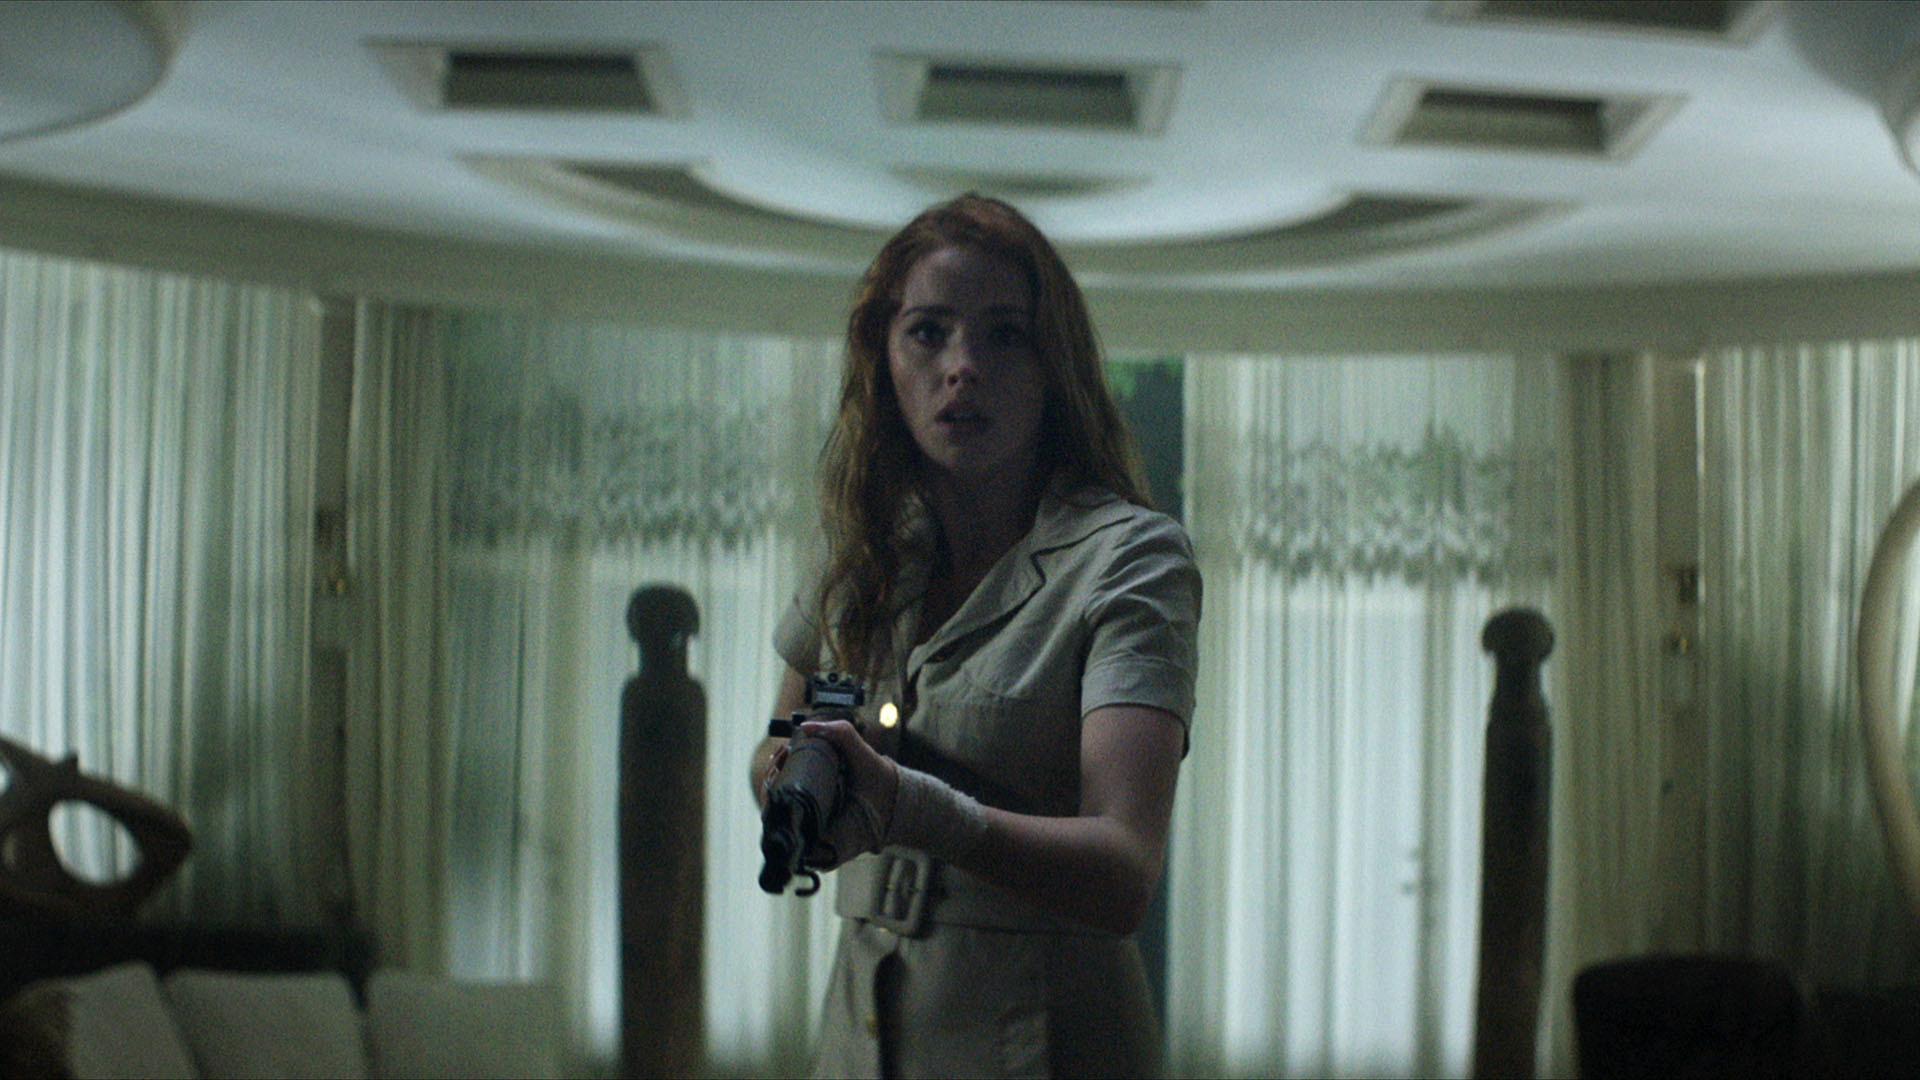 (C)2015 Waiting For Cinéma - Aliceléo - Waiting For K - Versus production - Wild Bunch - France 2 Cinéma -  BNP Paribas Fortis Film Finance – RTBF